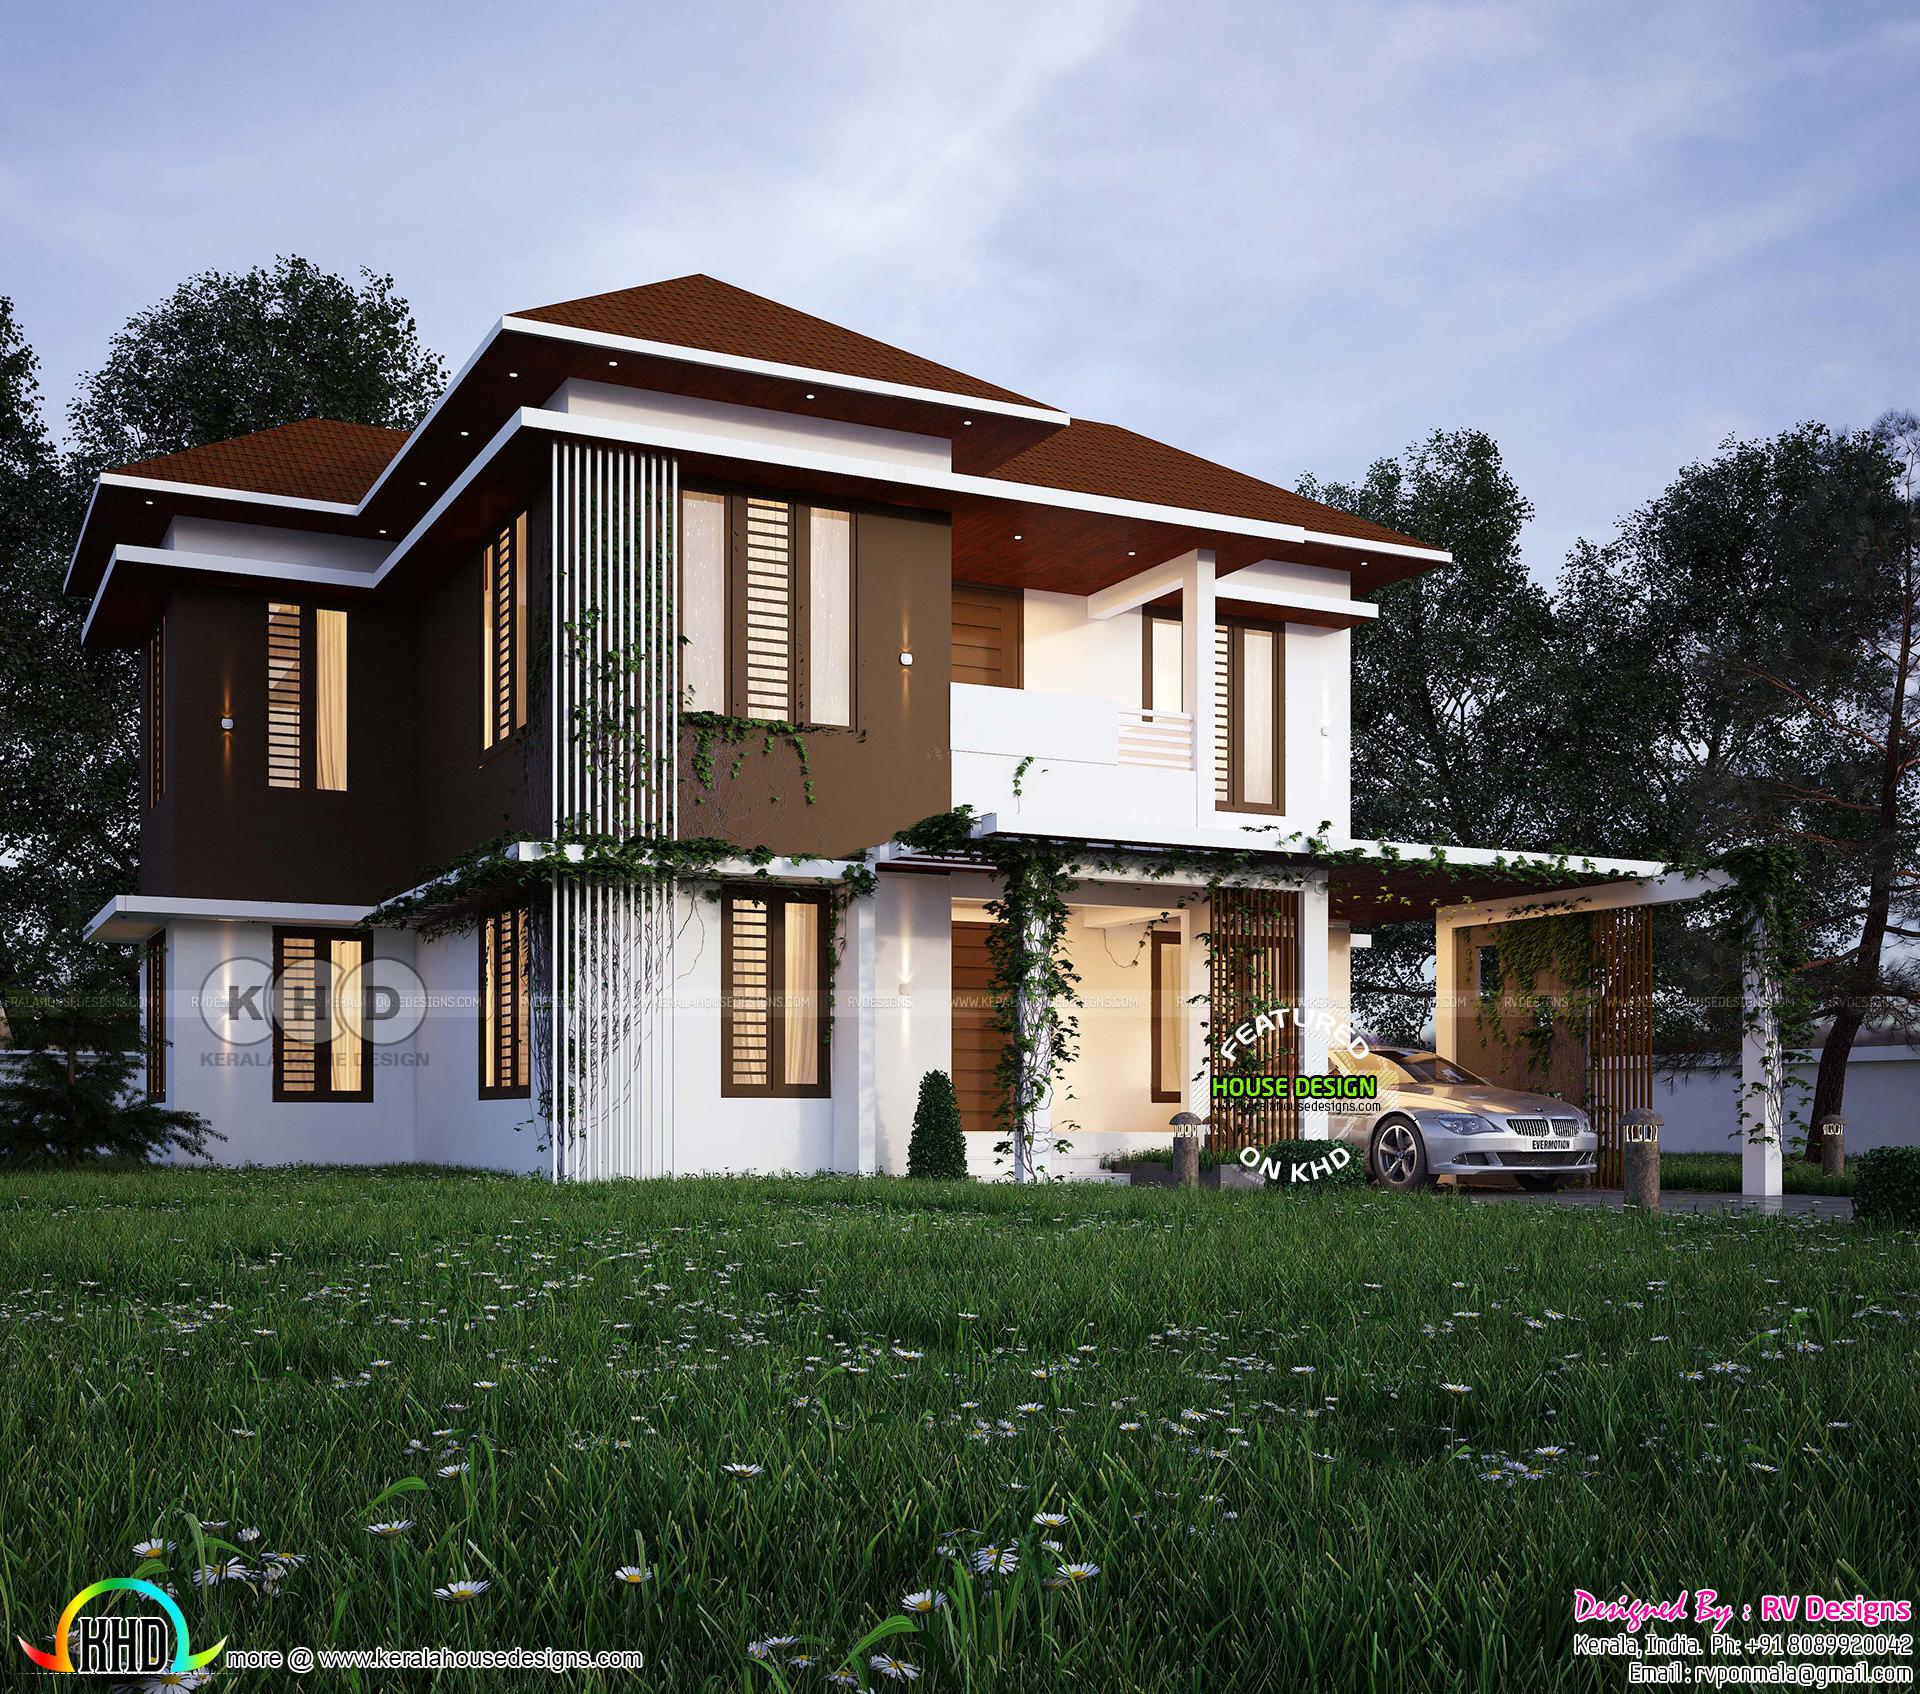 4 bhk 2273 square feet modern home design kerala home for 4 bhk home design